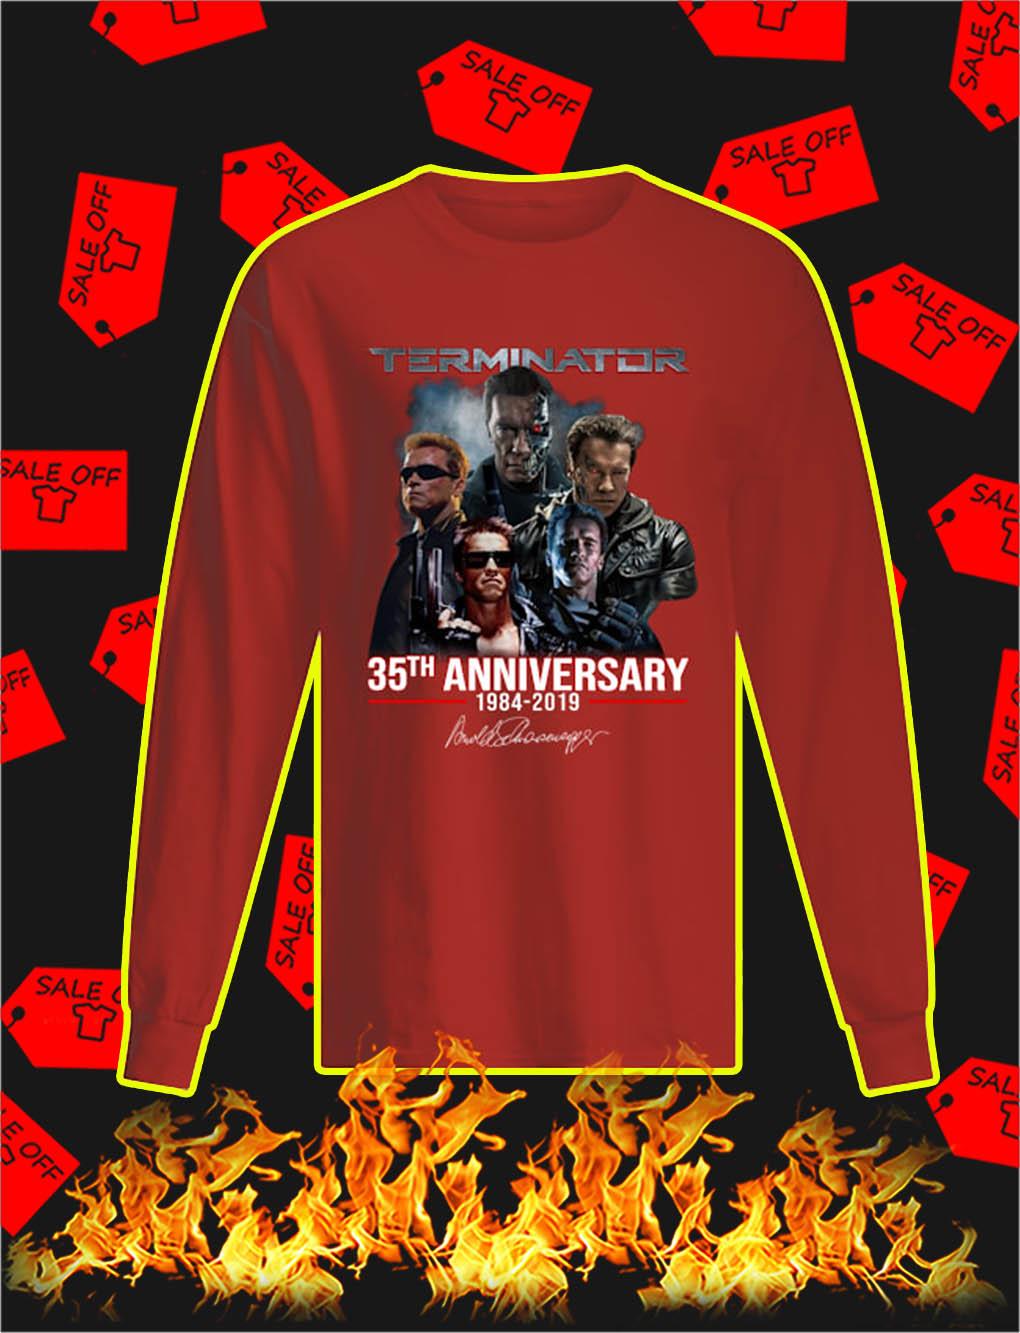 Terminator 35th Anniversary 1984 2019 longsleeve tee